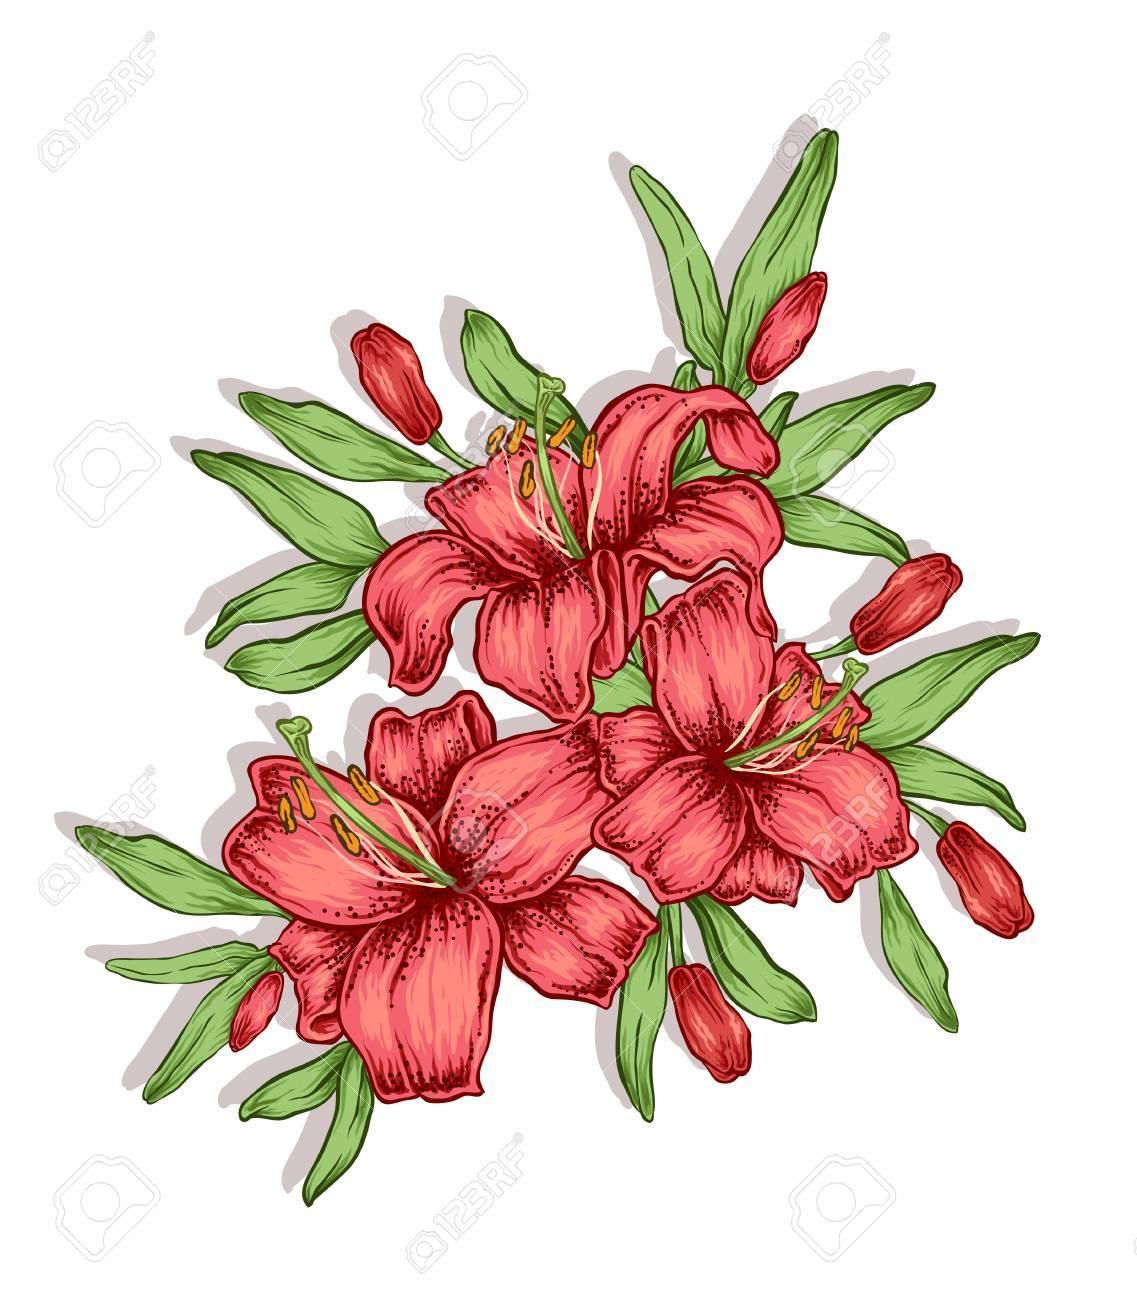 Hand drawn lily flowers decorative royal lilies composition hand drawn lily flowers decorative royal lilies composition tattoo or t shirt design izmirmasajfo